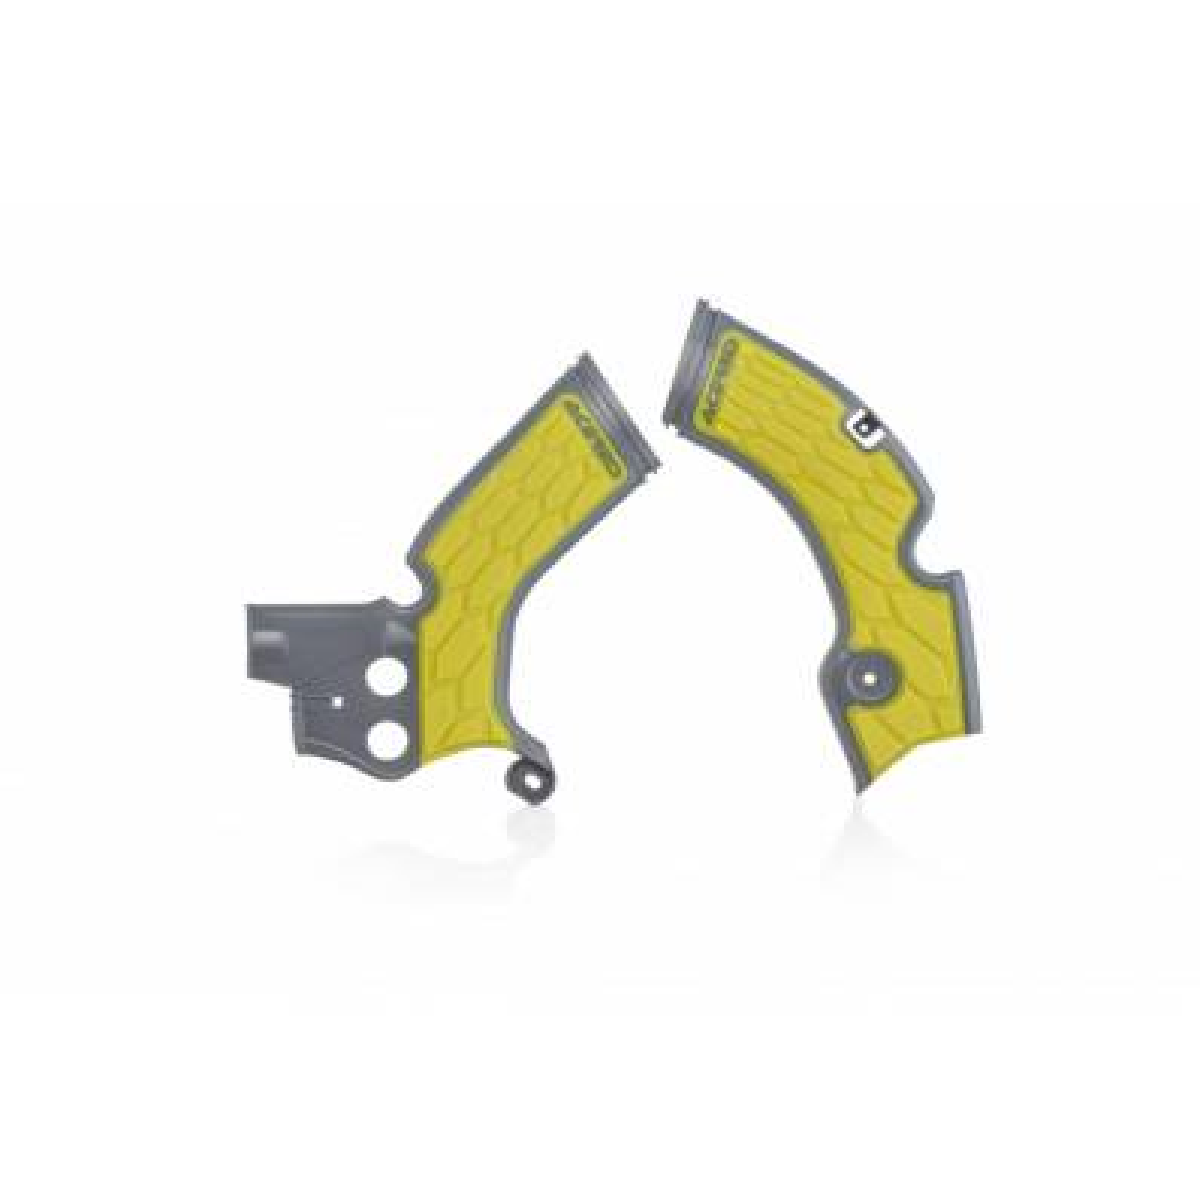 0022879-290 - Cubre Chasis Acerbis Rmz 250 15 17 Gris Amarillo